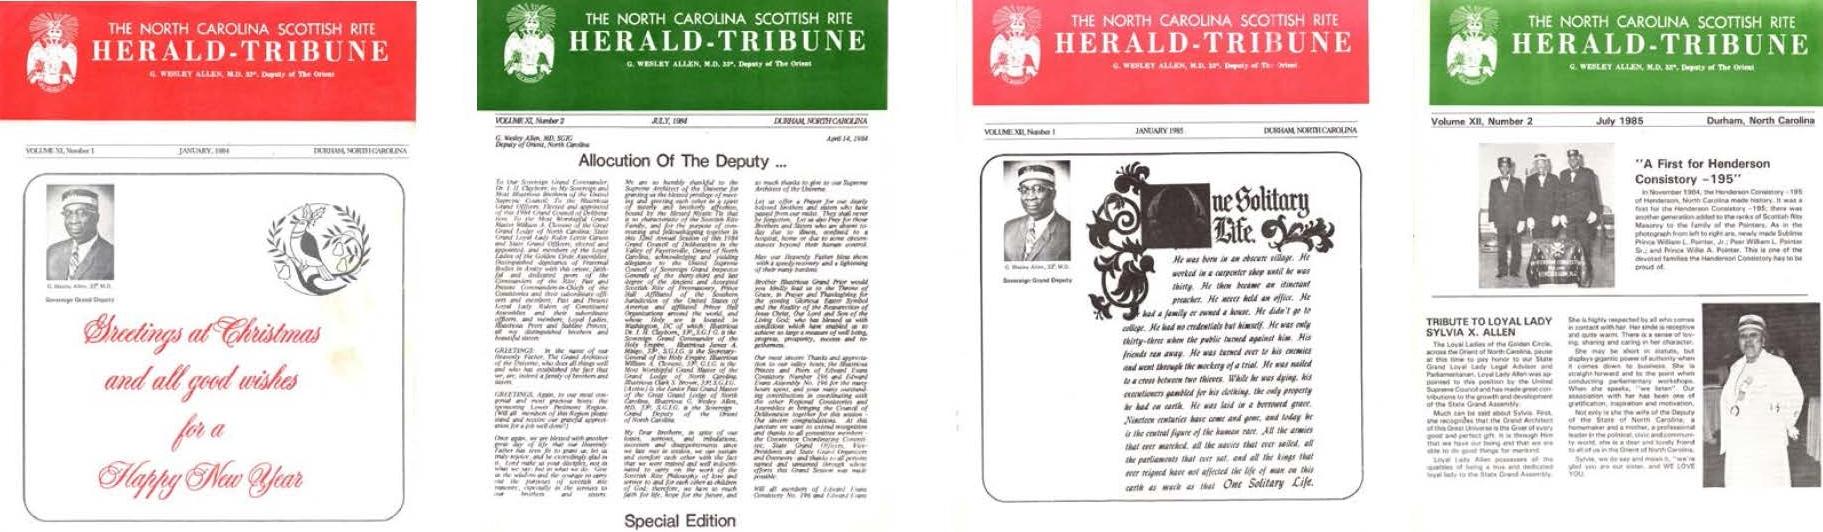 Herald Tribune set 1 of 4 - Copy